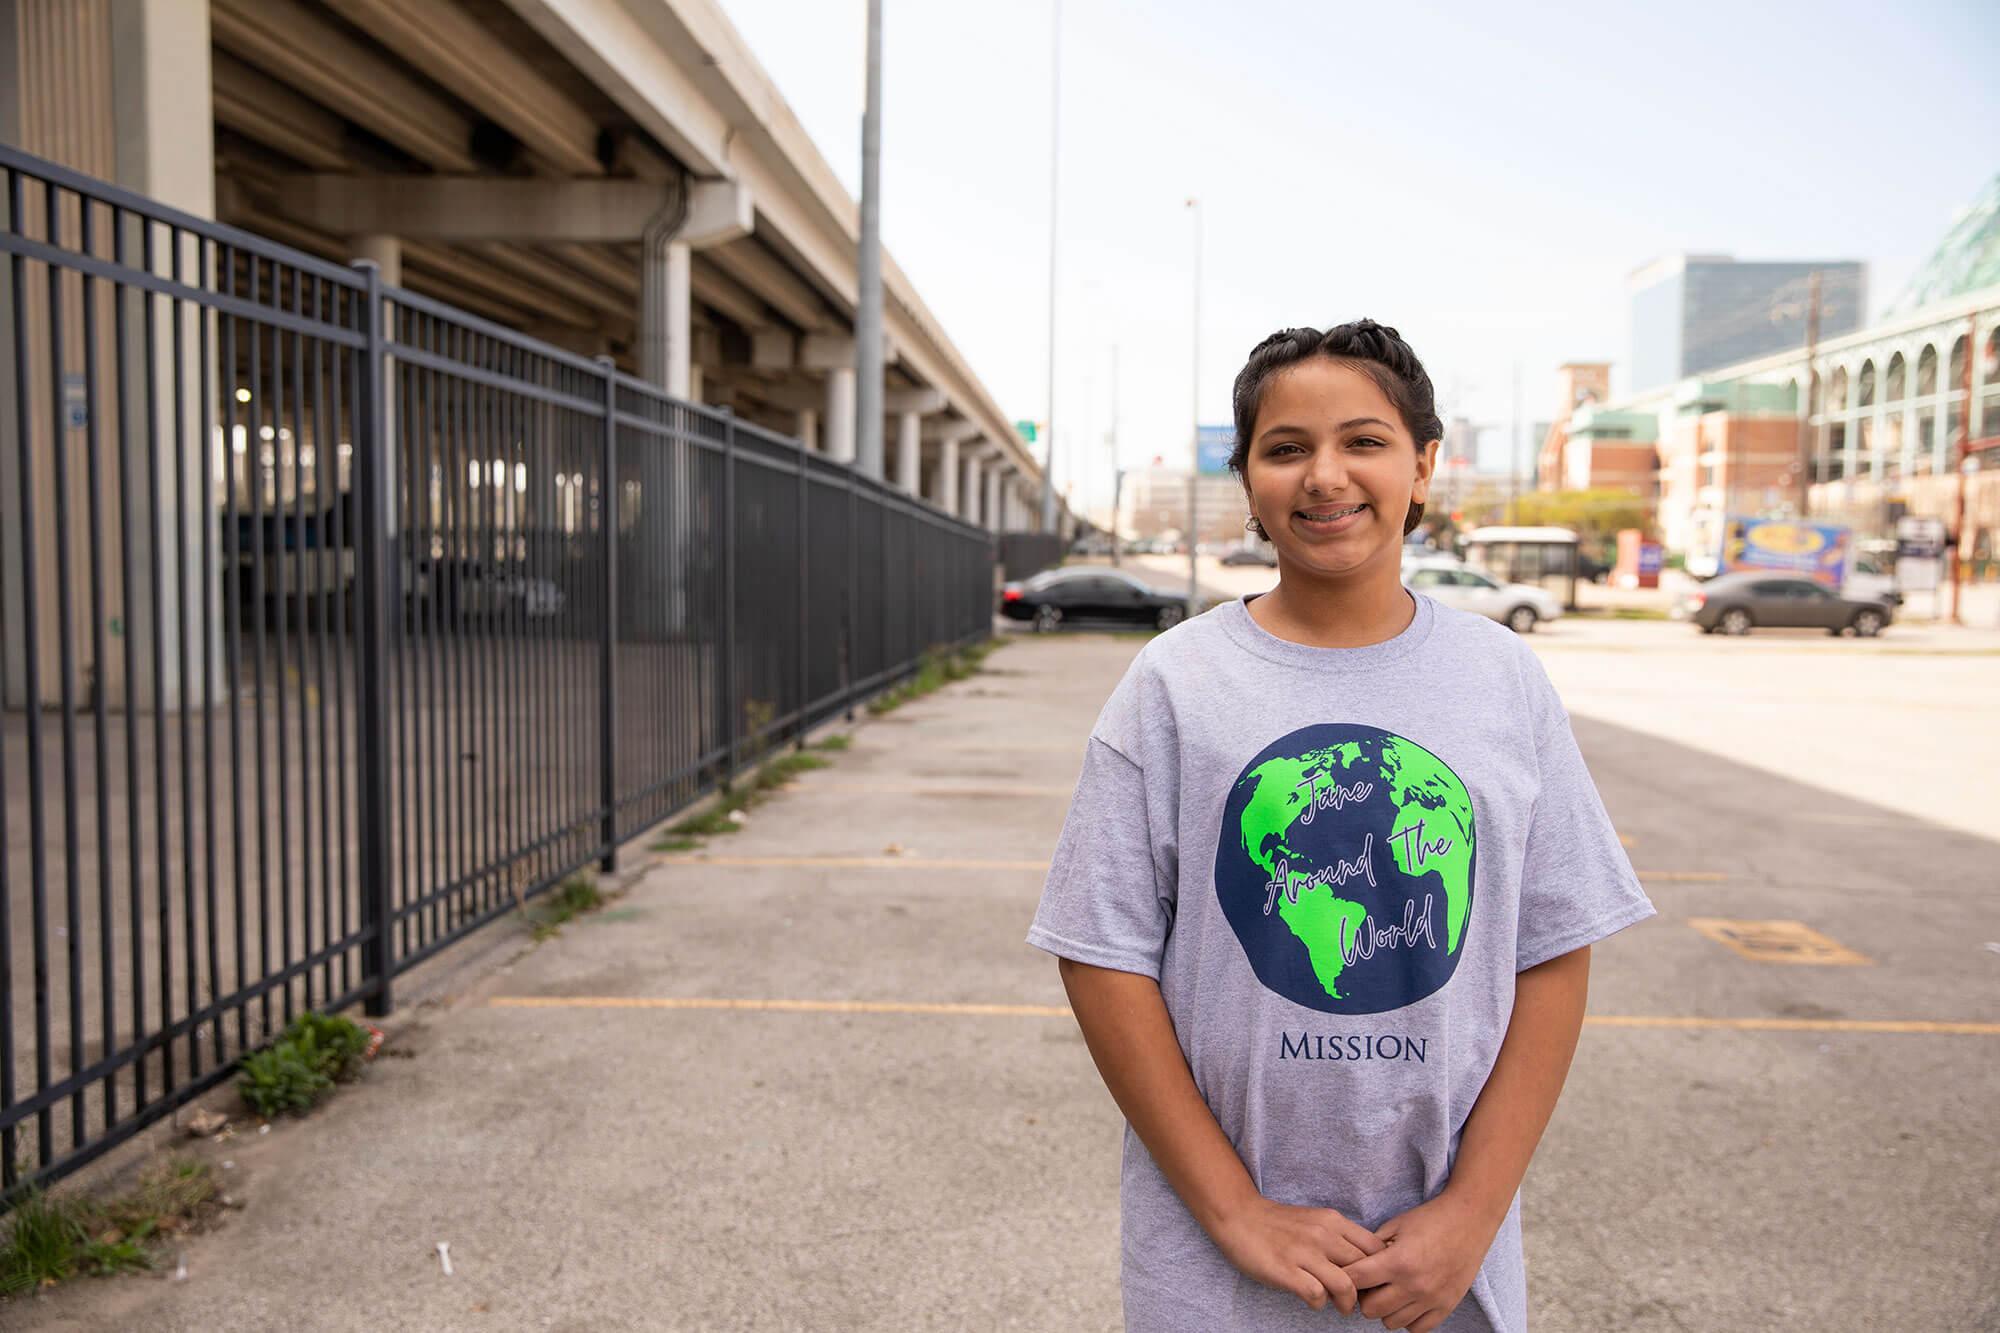 Jane Khan standing under an overpass where she is feeding homeless people.